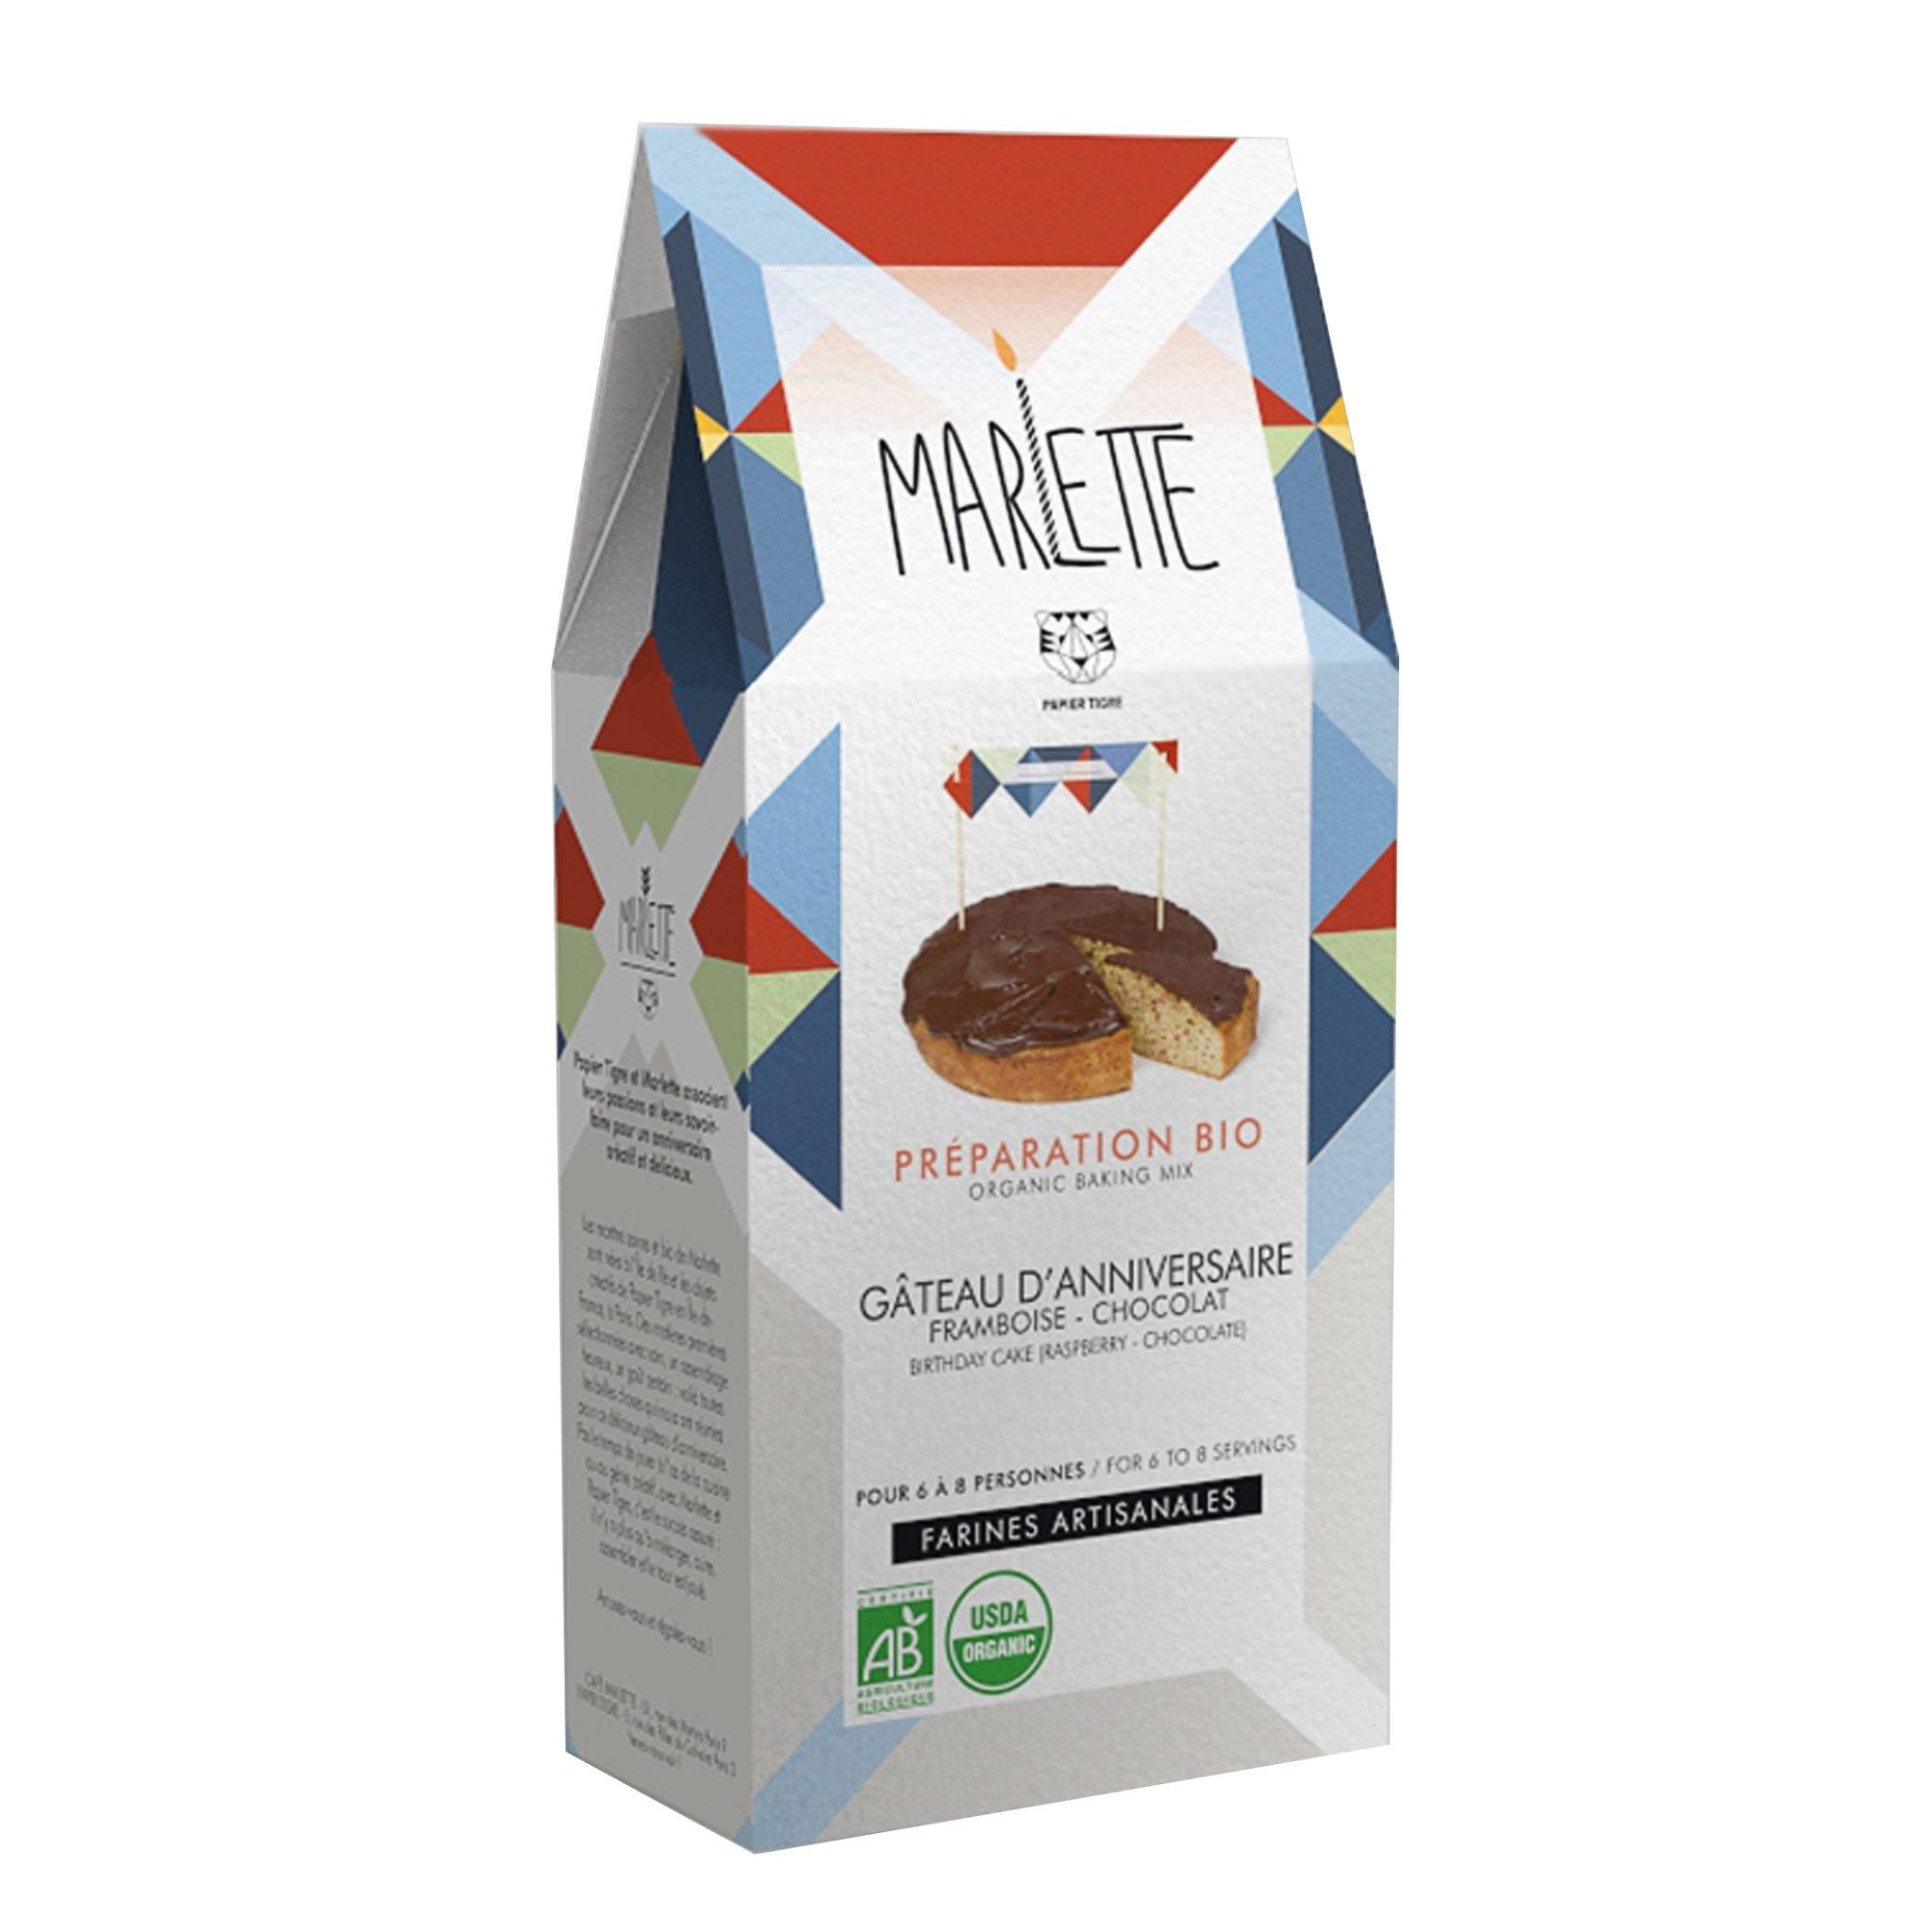 Astounding Organic Birthday Cake Baking Mix Marlette Croque Maman Personalised Birthday Cards Akebfashionlily Jamesorg